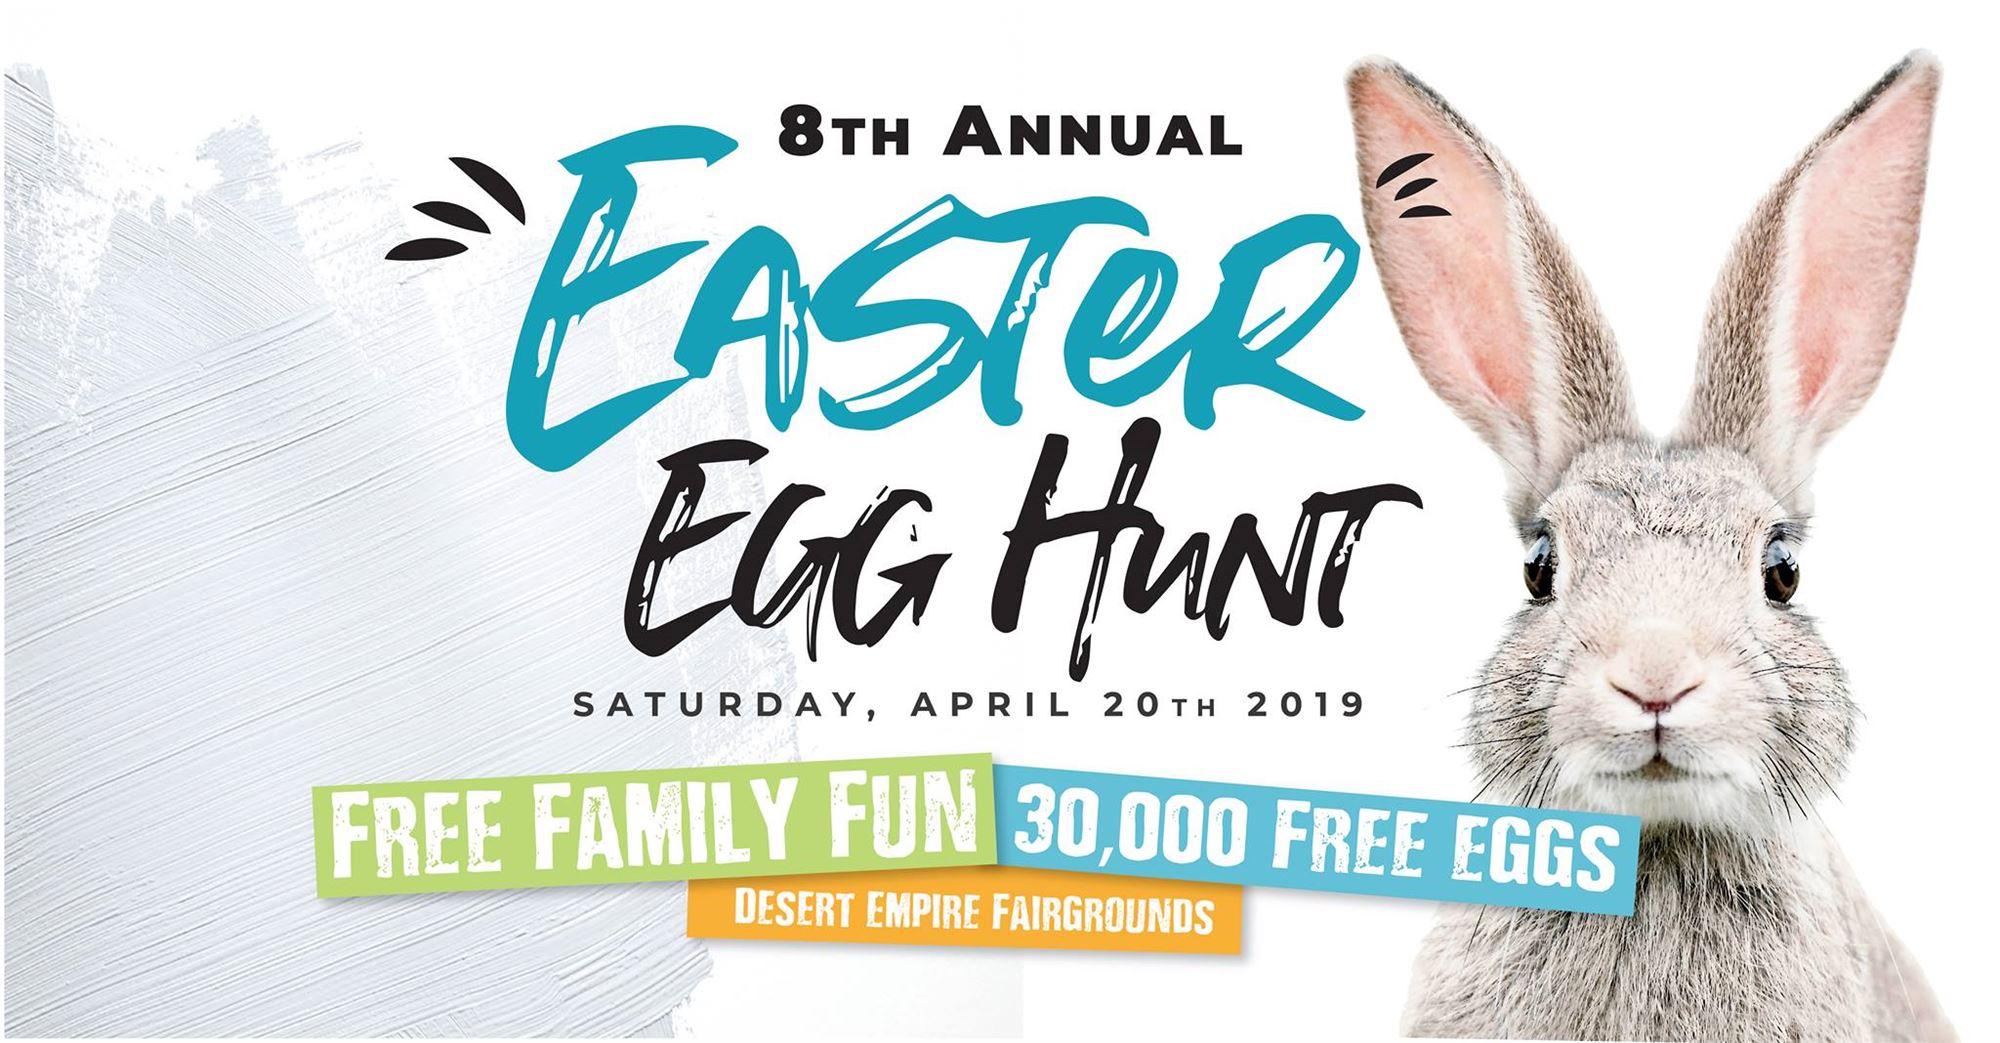 April 20th: Annual Community Easter Egg Hunt